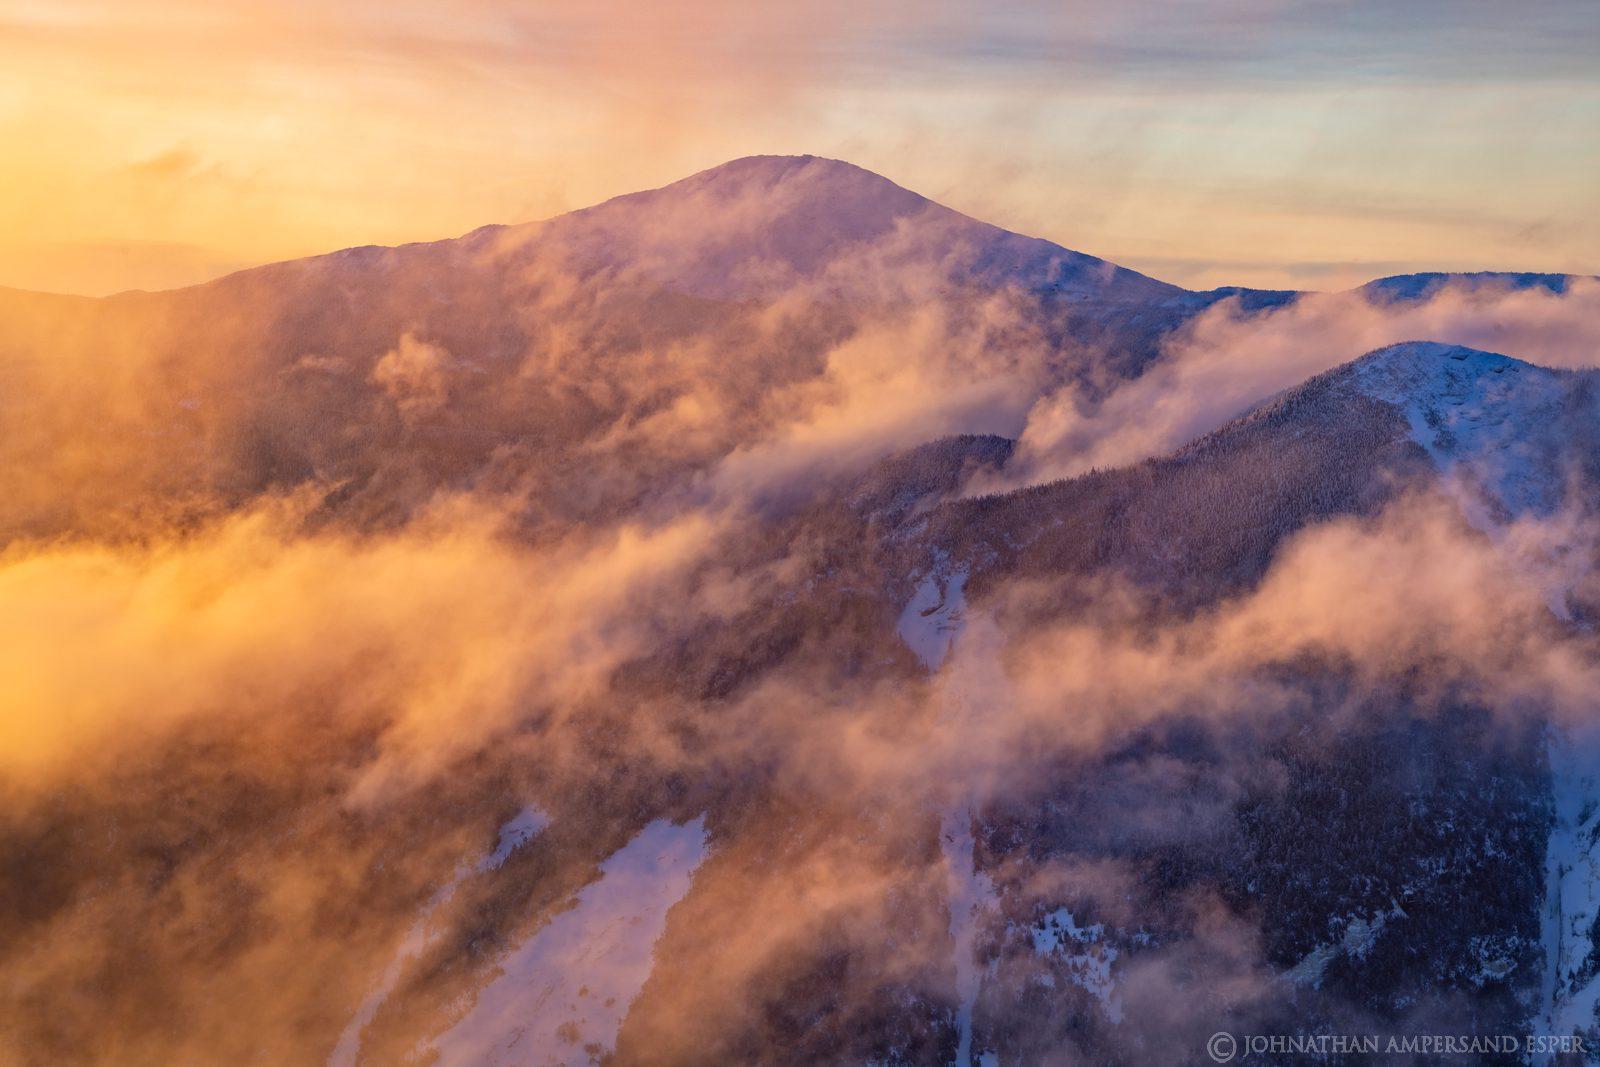 Mt Marcy,Mt. Marcy,High Peaks,winter 2020,2020,winter,snow,Adirondack Mountains,Adirondacks,sunrise,Wright Peak,Wright,Wright...